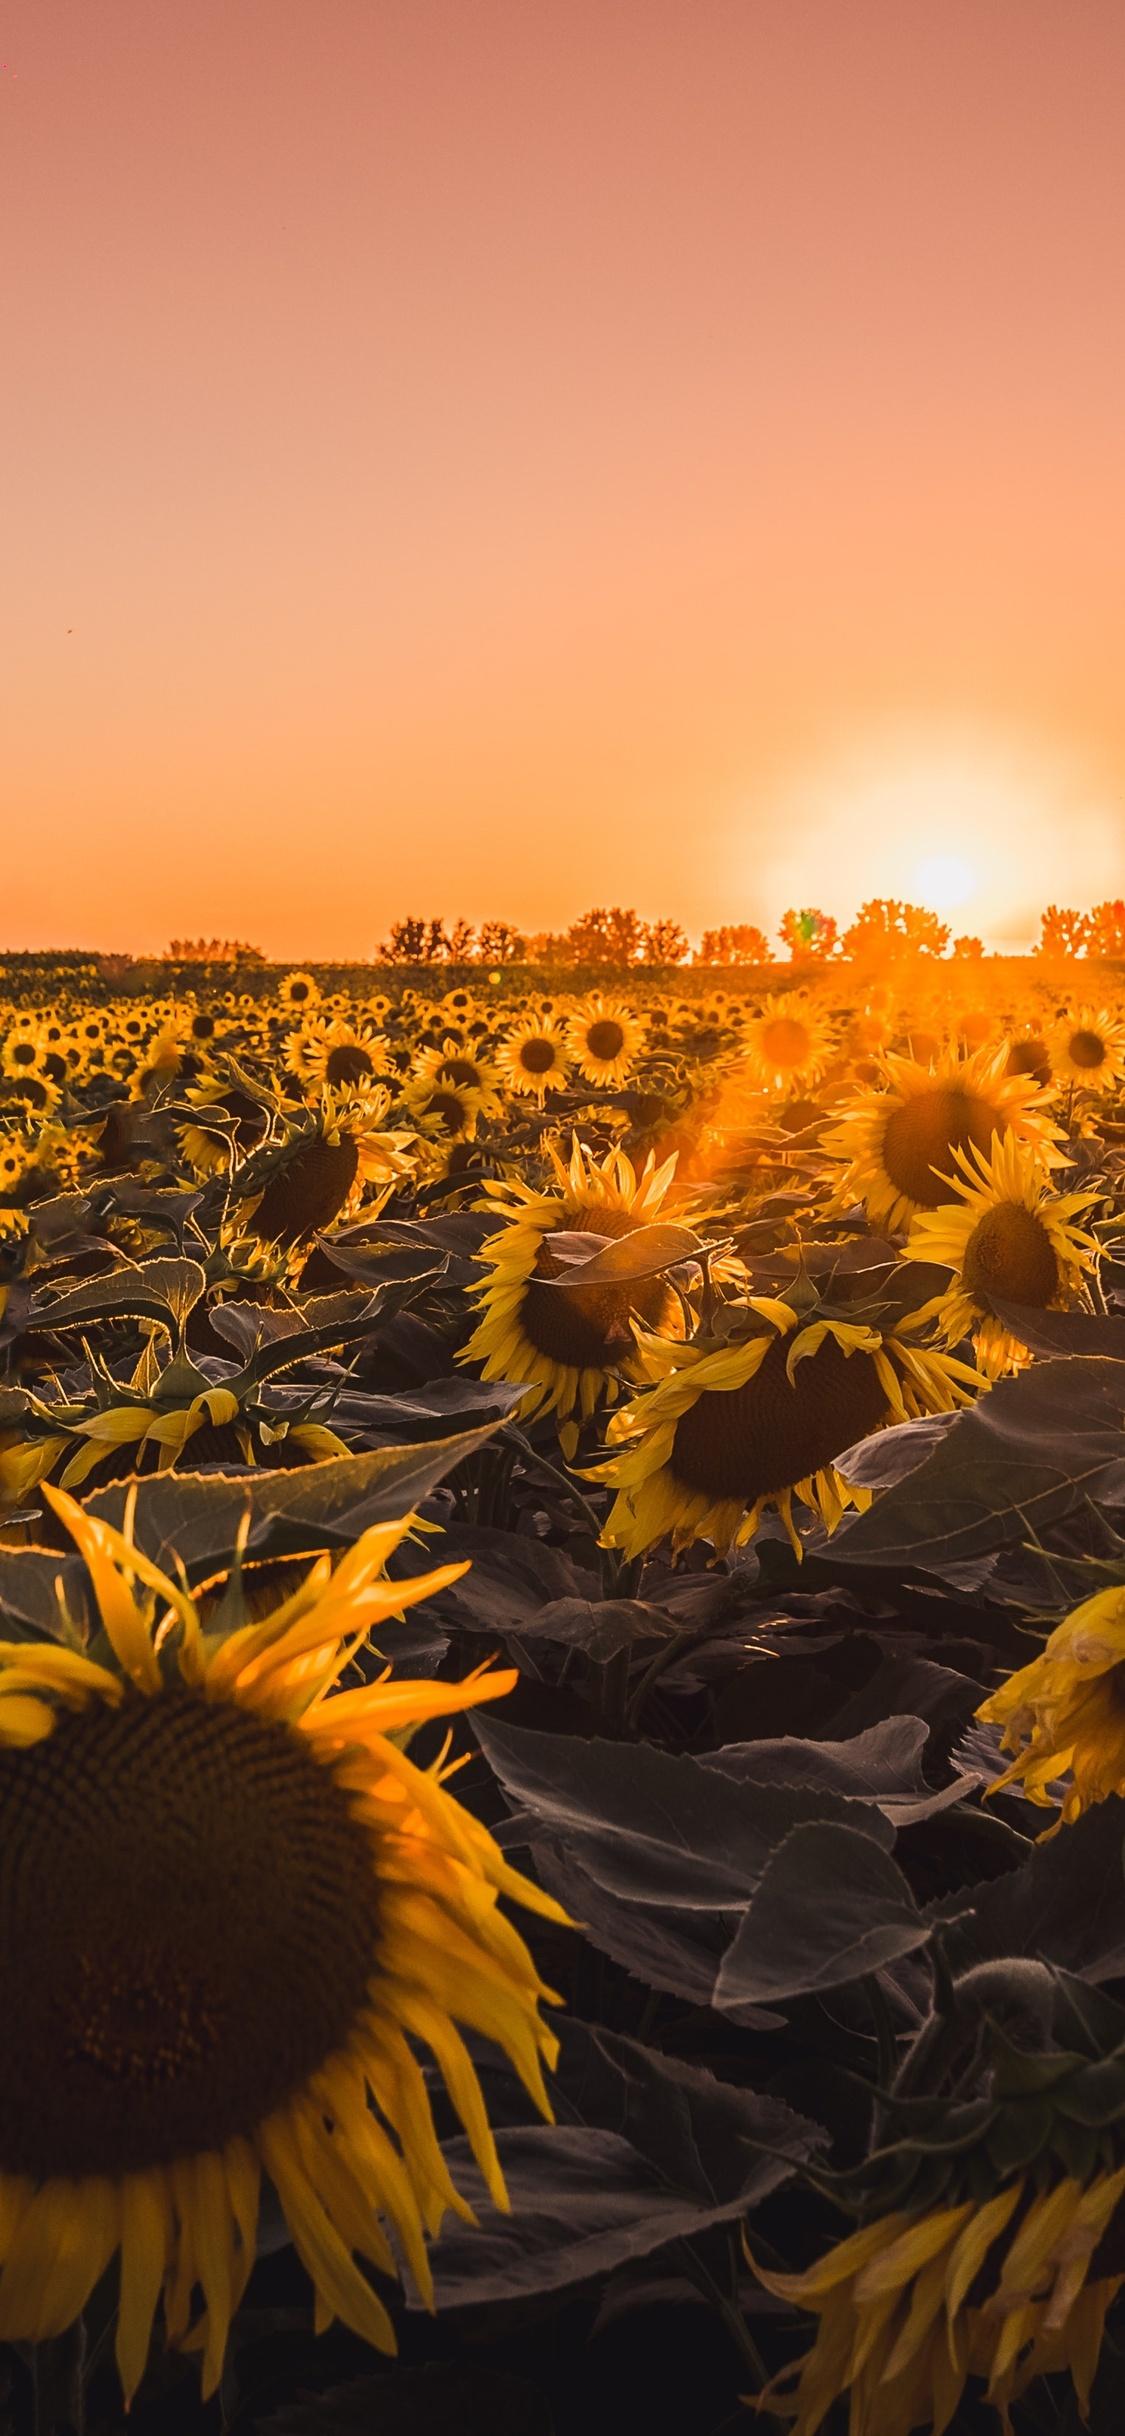 1125x2436 Sunflowers Farm Golden Hour 5k Iphone XS,Iphone 10